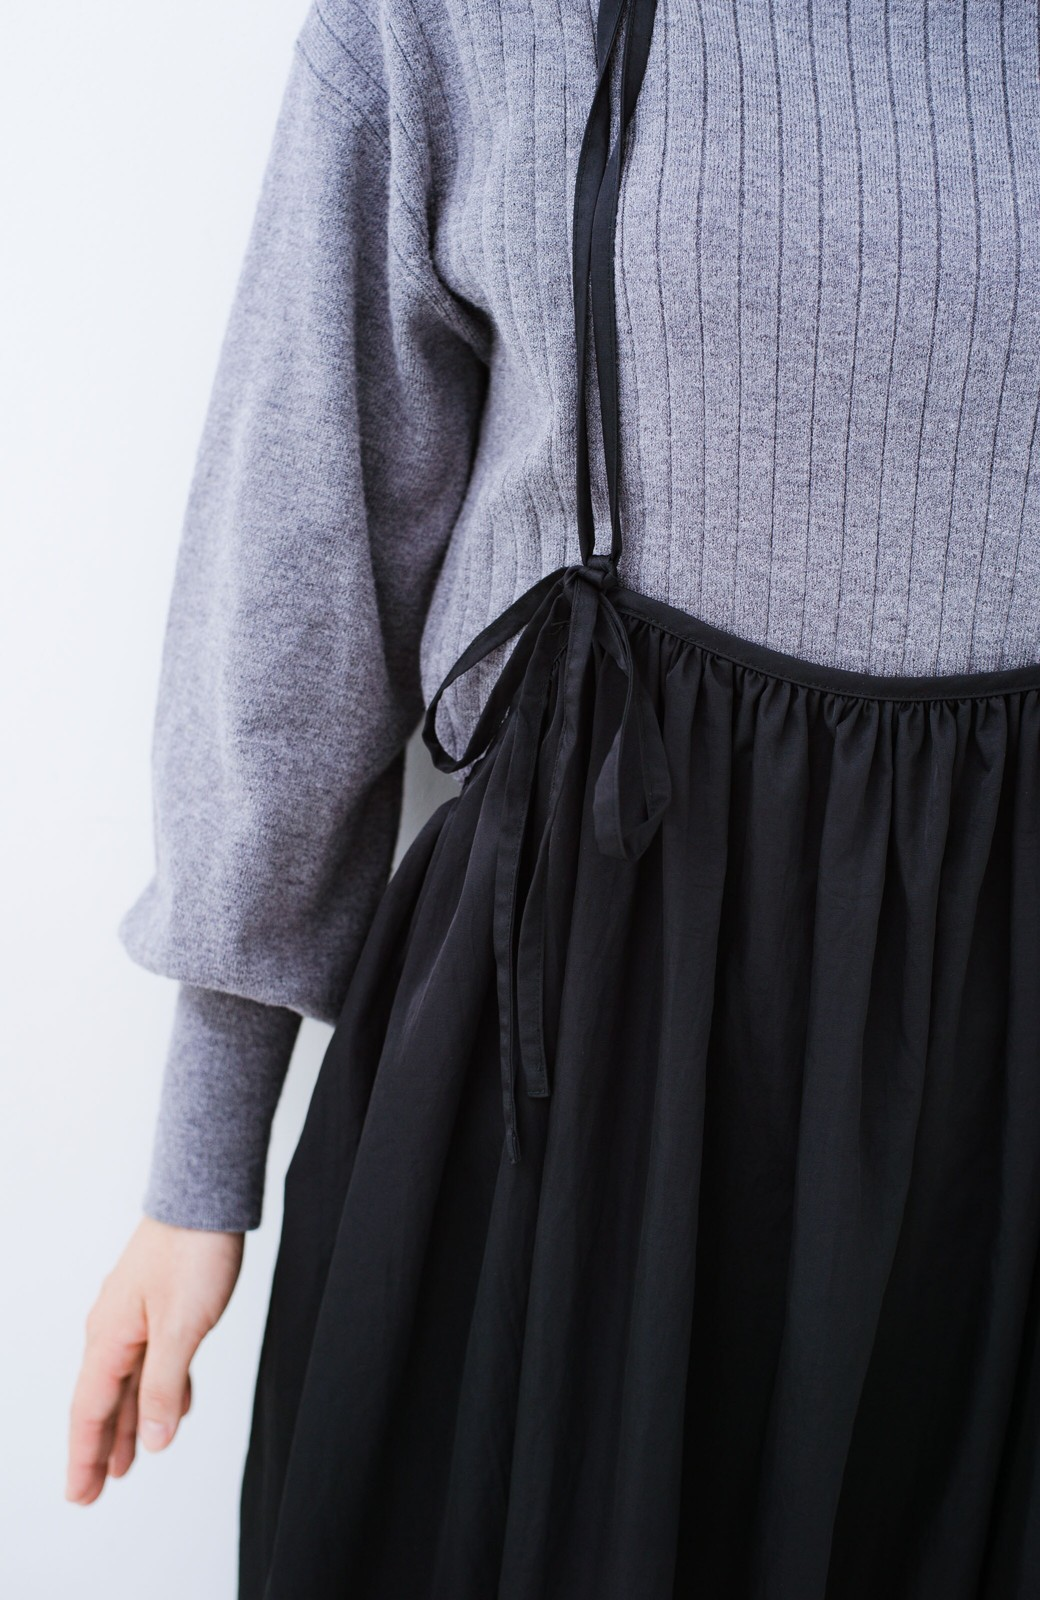 haco! 女の子バンザイ!プロジェクト【ブルー期】 ニットですら重ね着できる安心さ ゆったりギャザーキャミワンピ <ブラック>の商品写真13